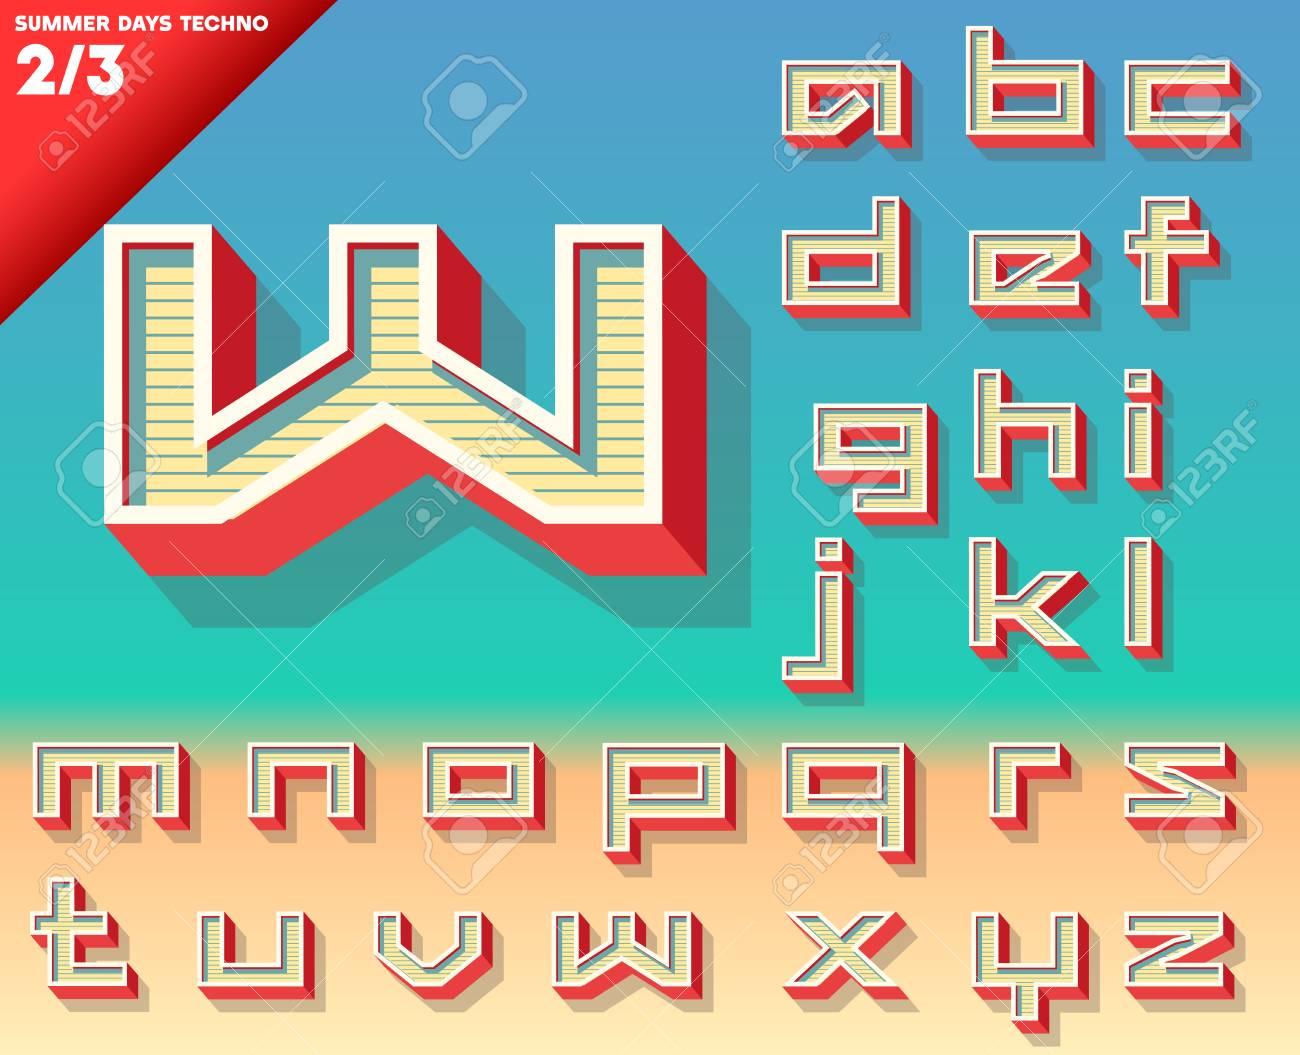 Vector retro alphabet for Summer typography design  Techno style  Small cases Stock Vector - 24078561